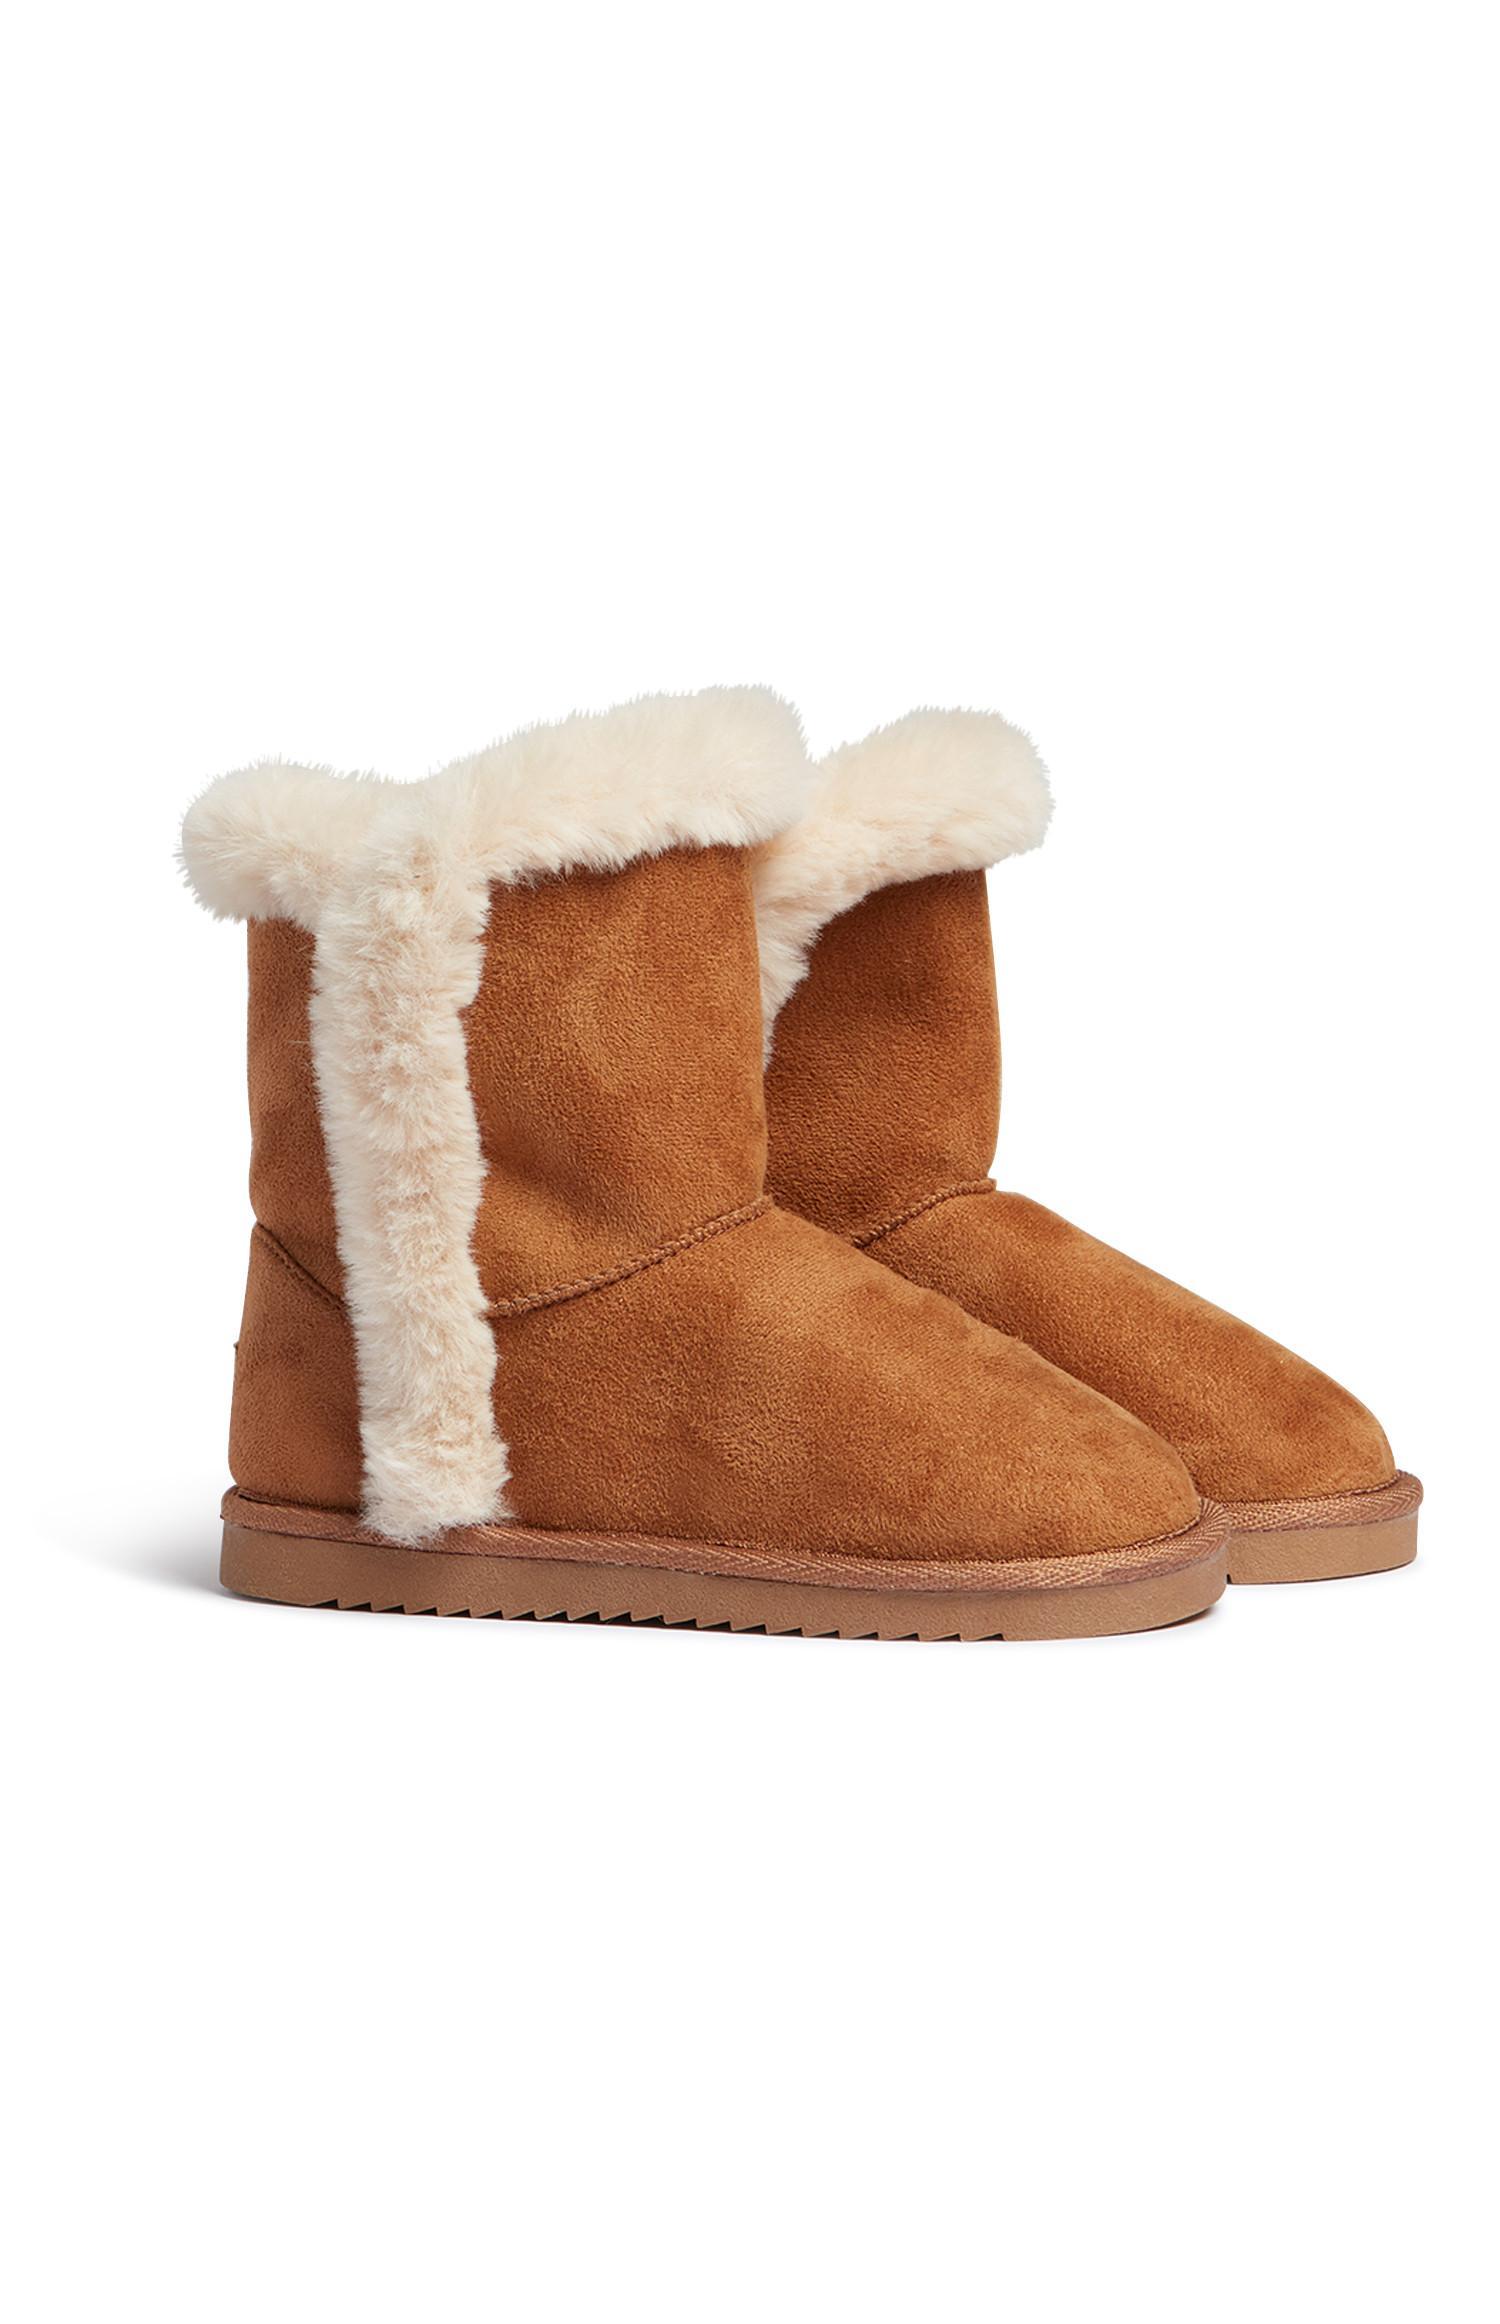 Older Girl Tan Snug Boot